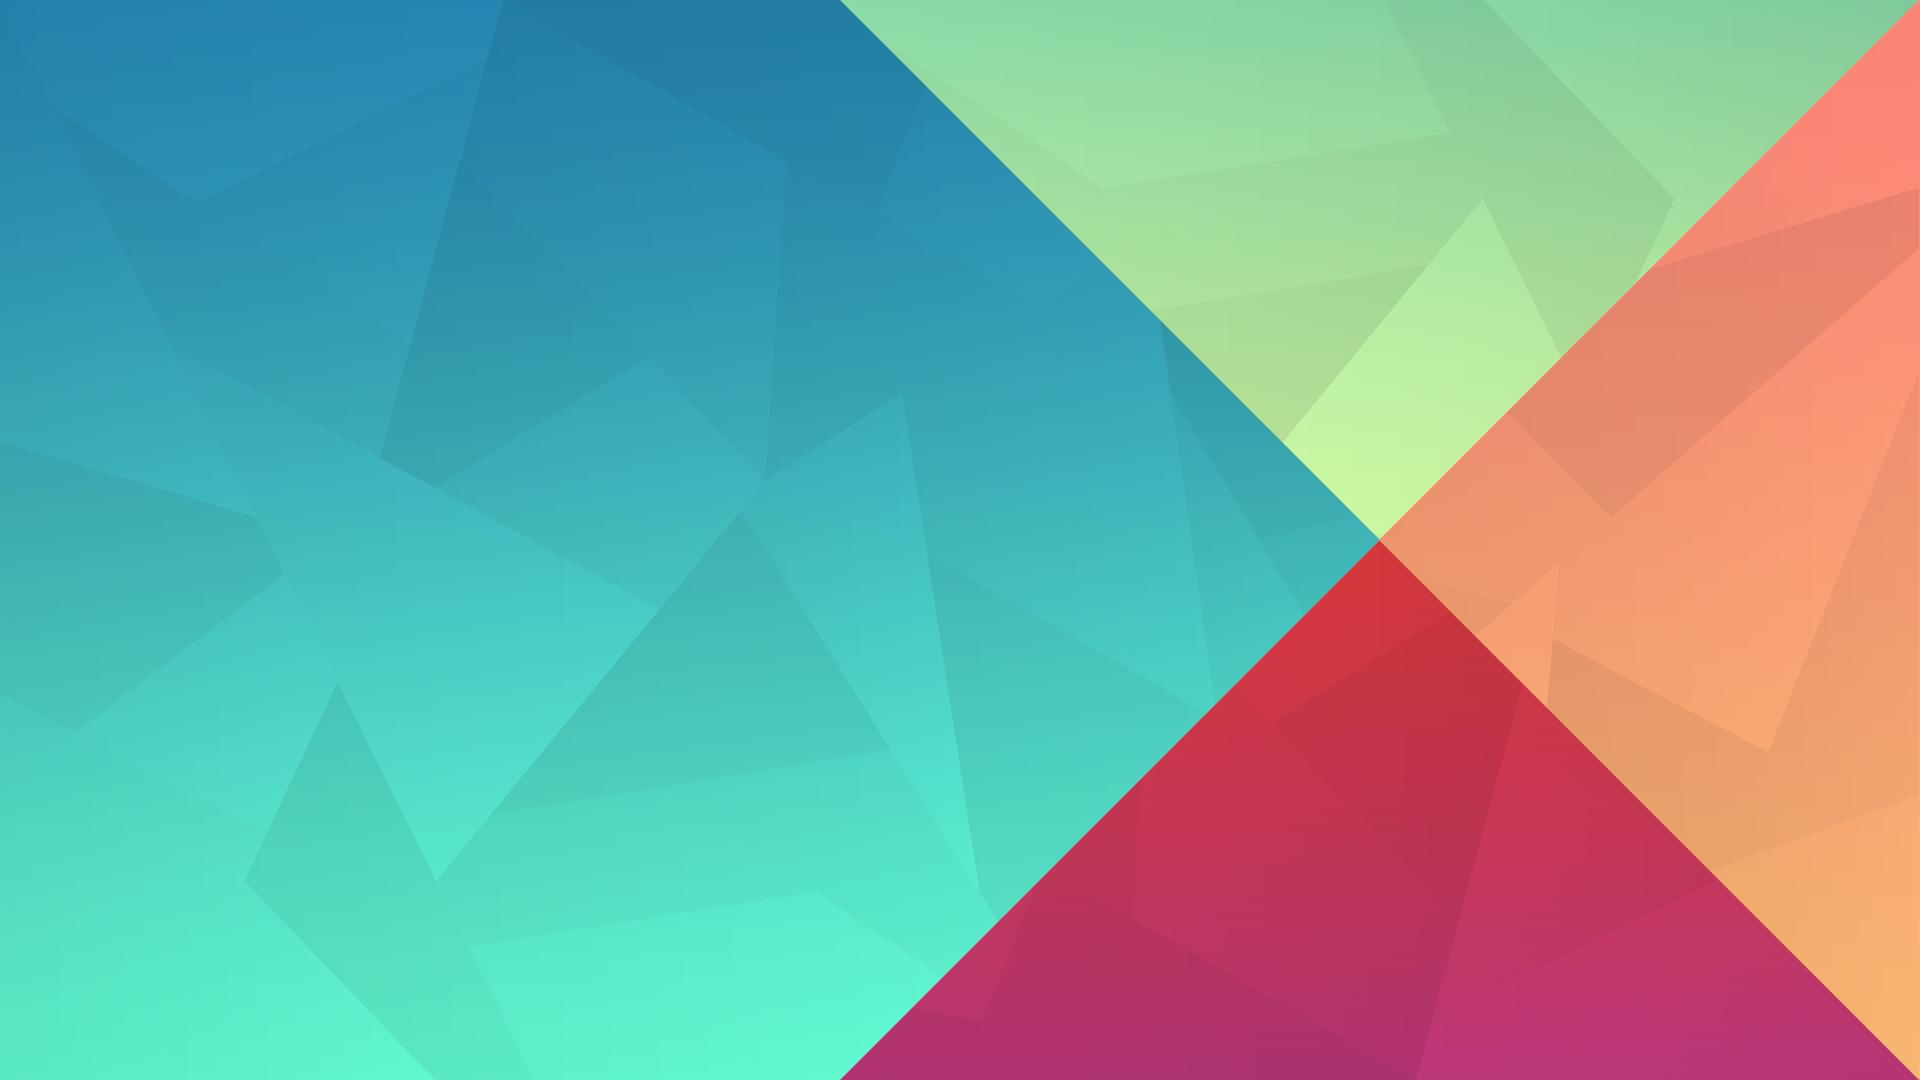 Google Abstract HD Wallpaper 1920x1080